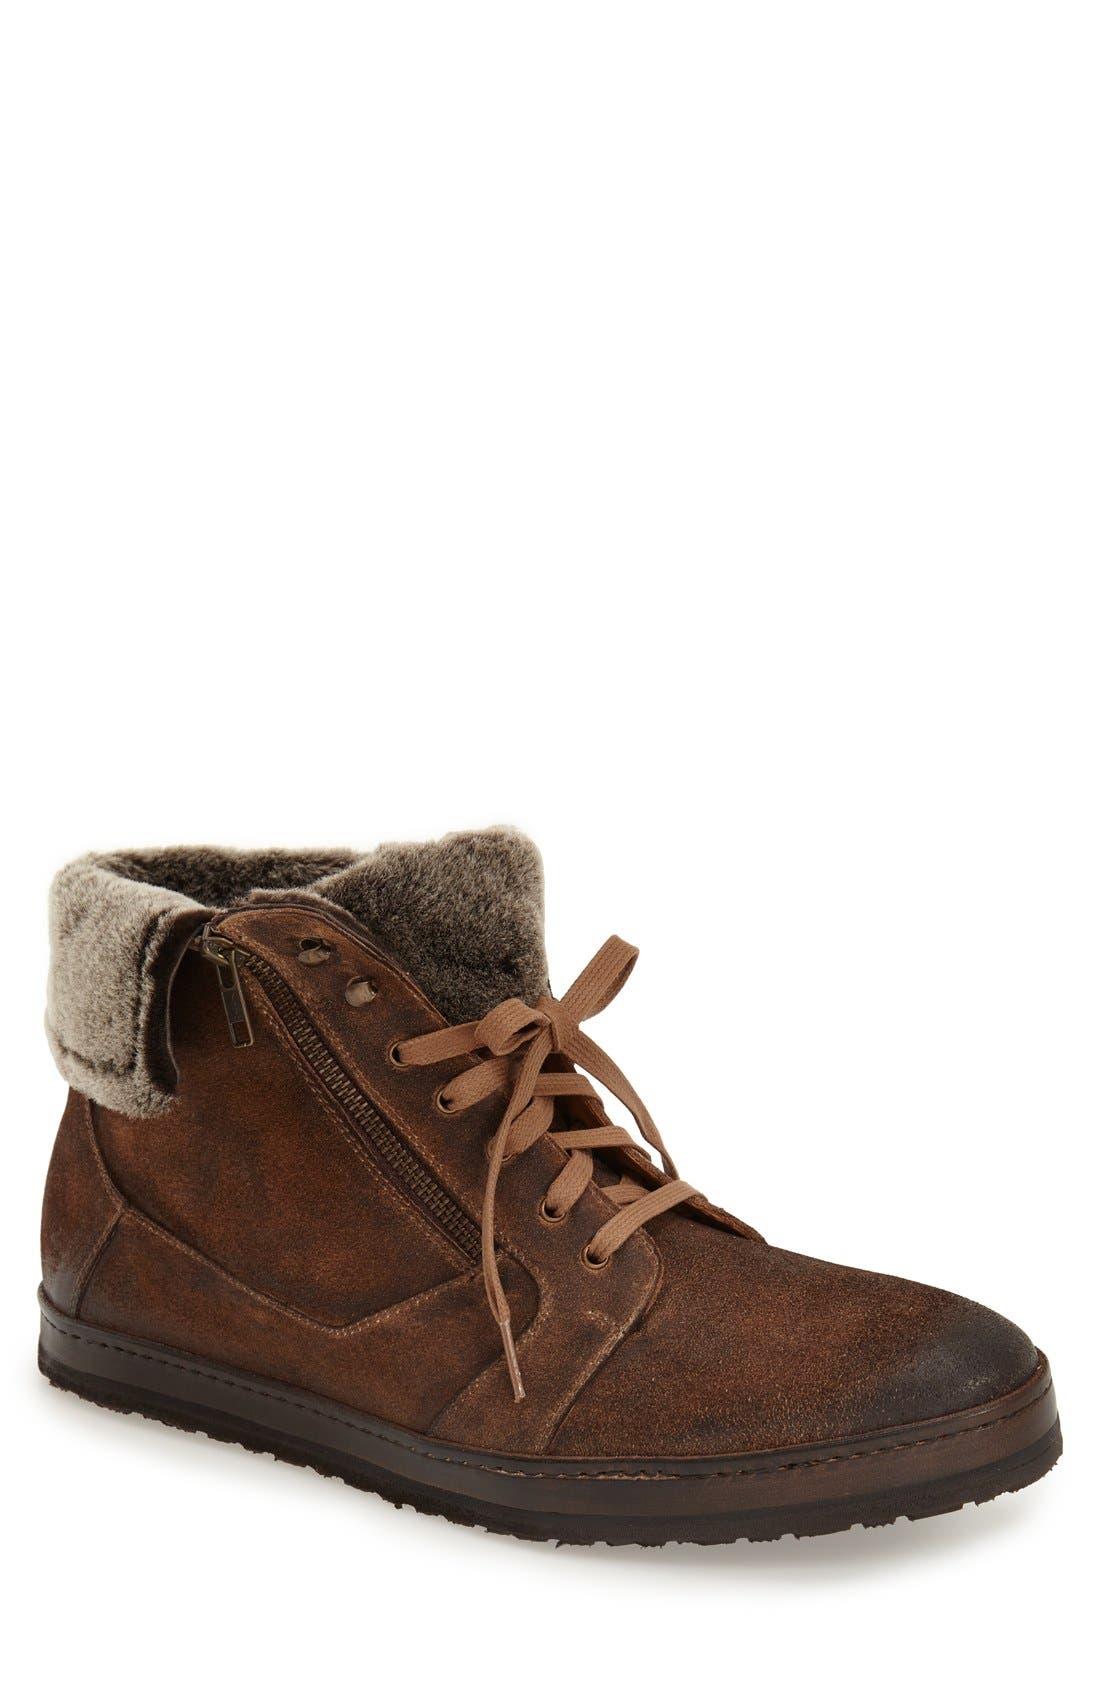 'Utrech' Sneaker Boot,                         Main,                         color, 238